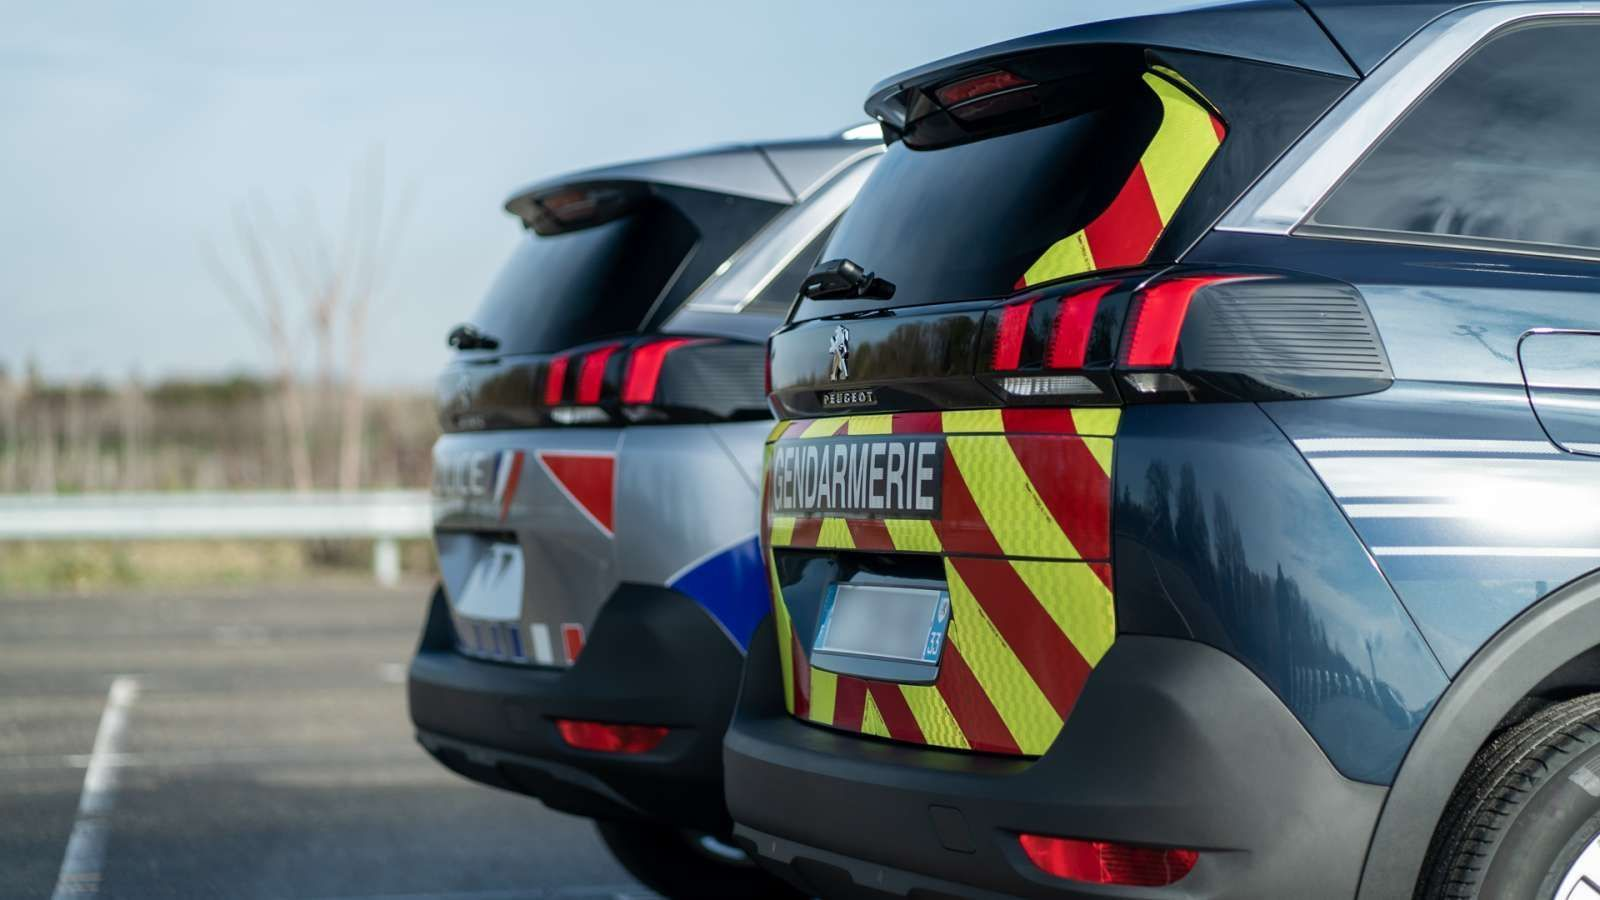 Peugeot 5008 police gendarmerie 18